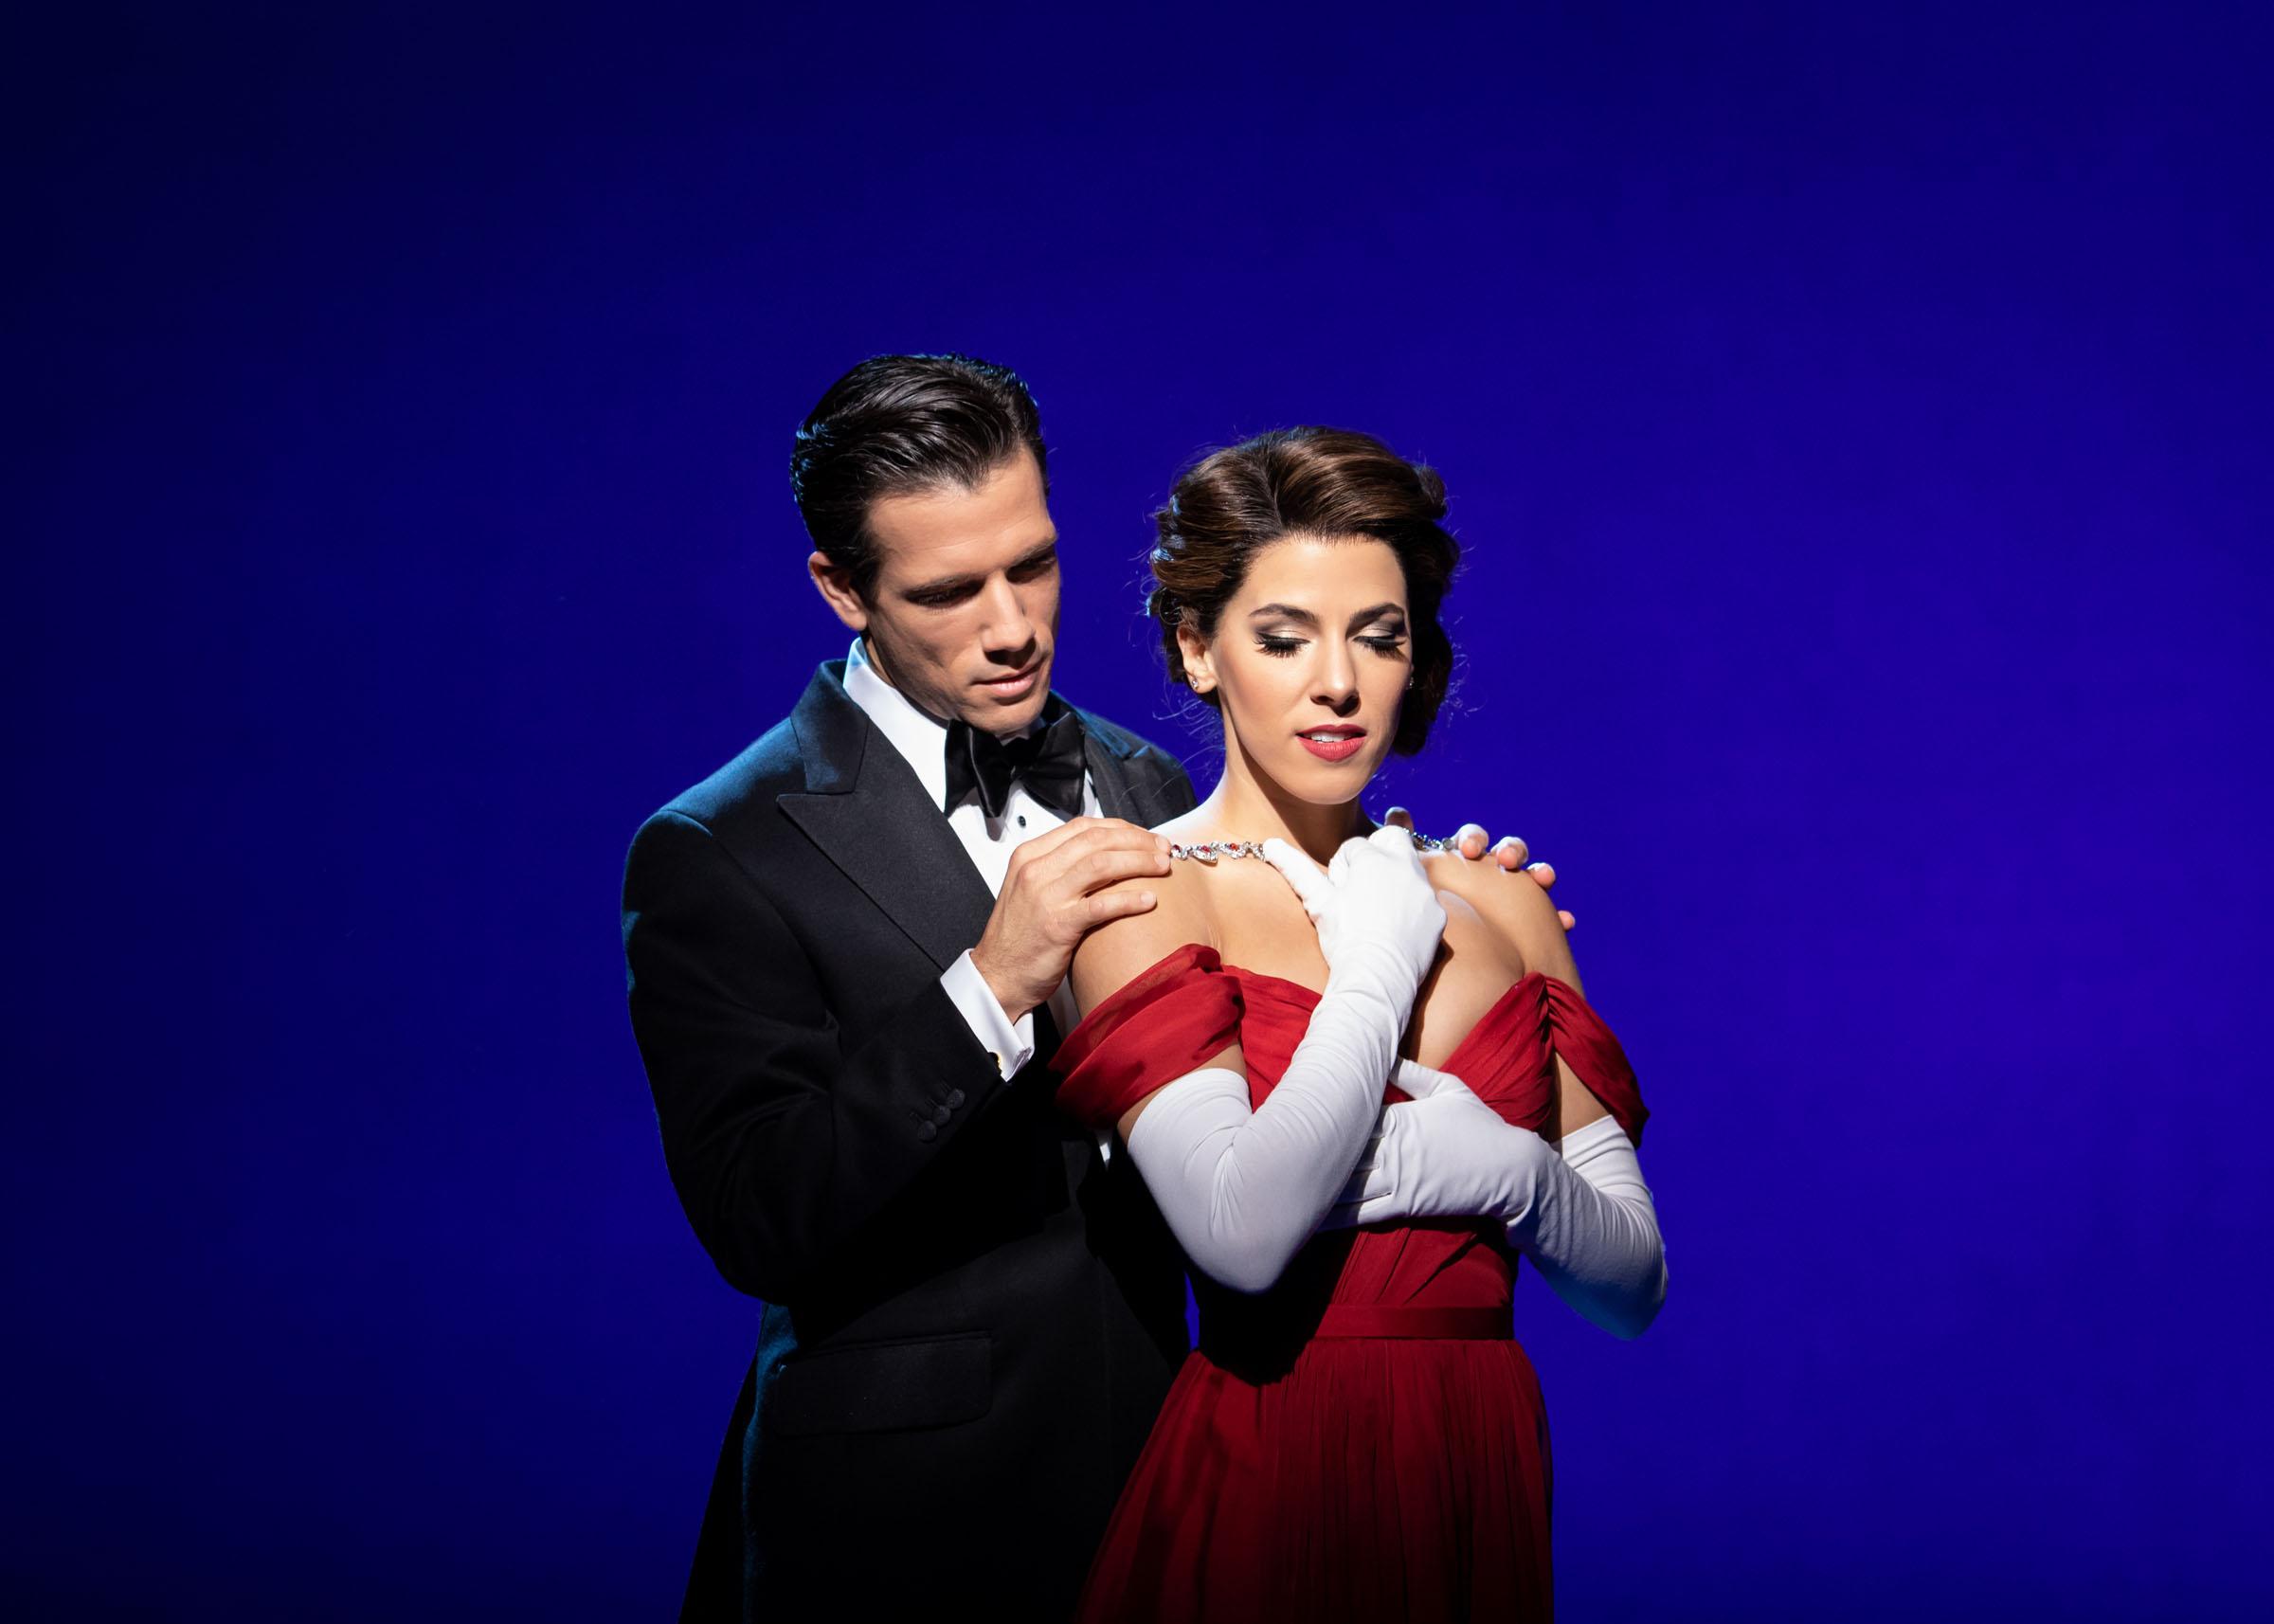 Danny Mac (Edward Lewis) and Aimie Atkinson (Vivian Ward) in Pretty Woman